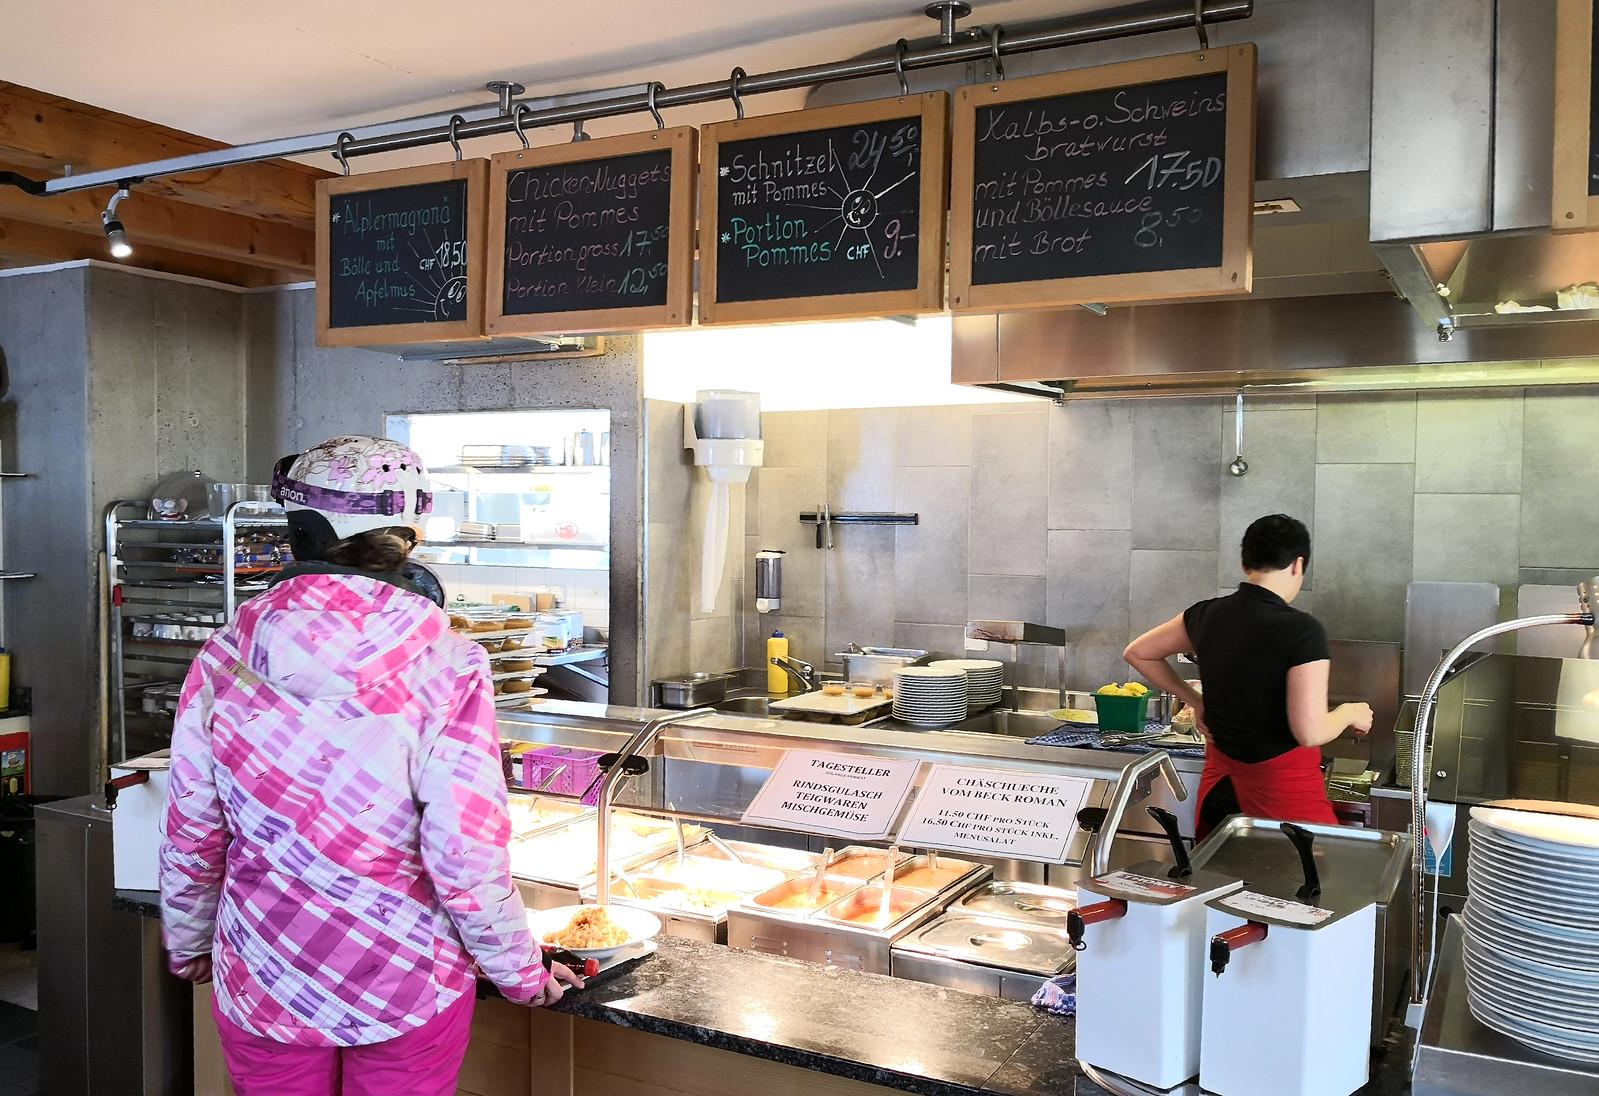 Gipfelrestaurant self-service counter